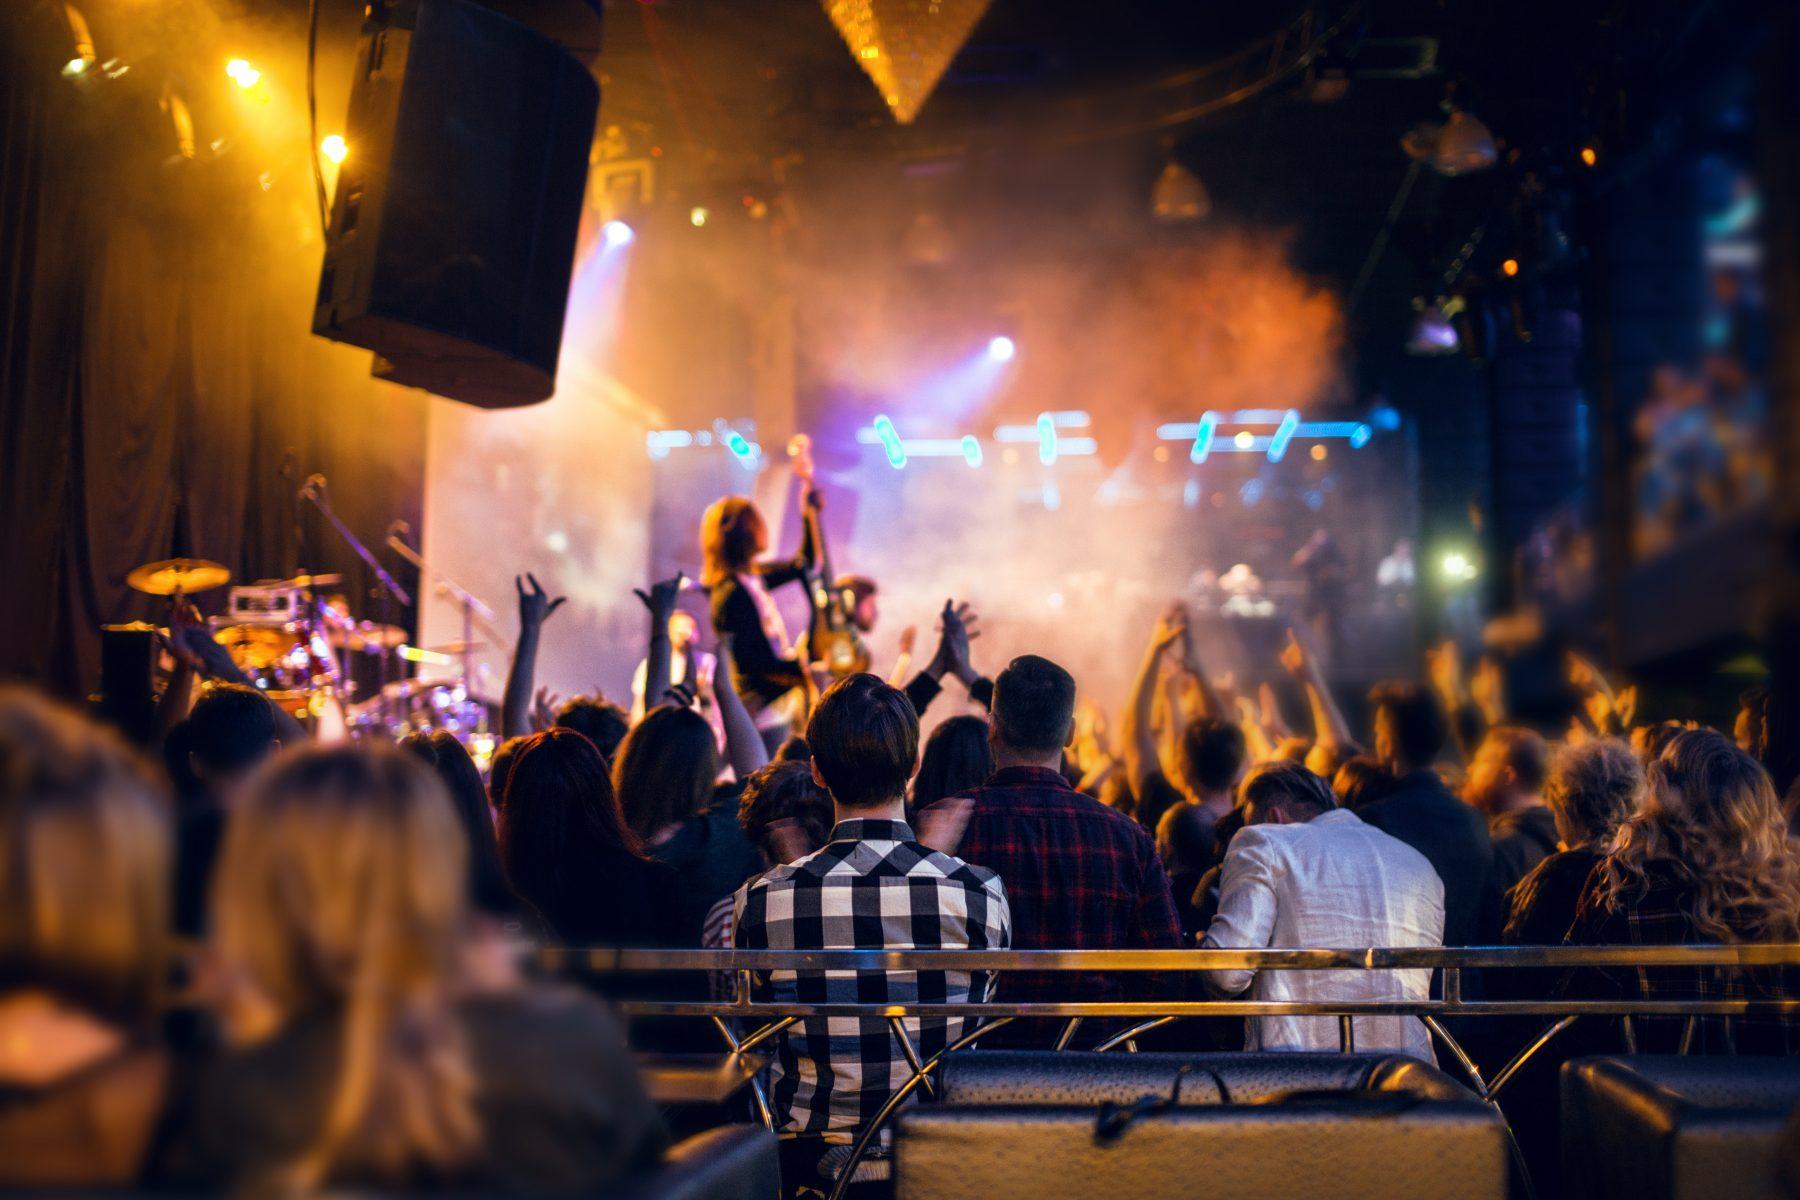 VIP access at concert